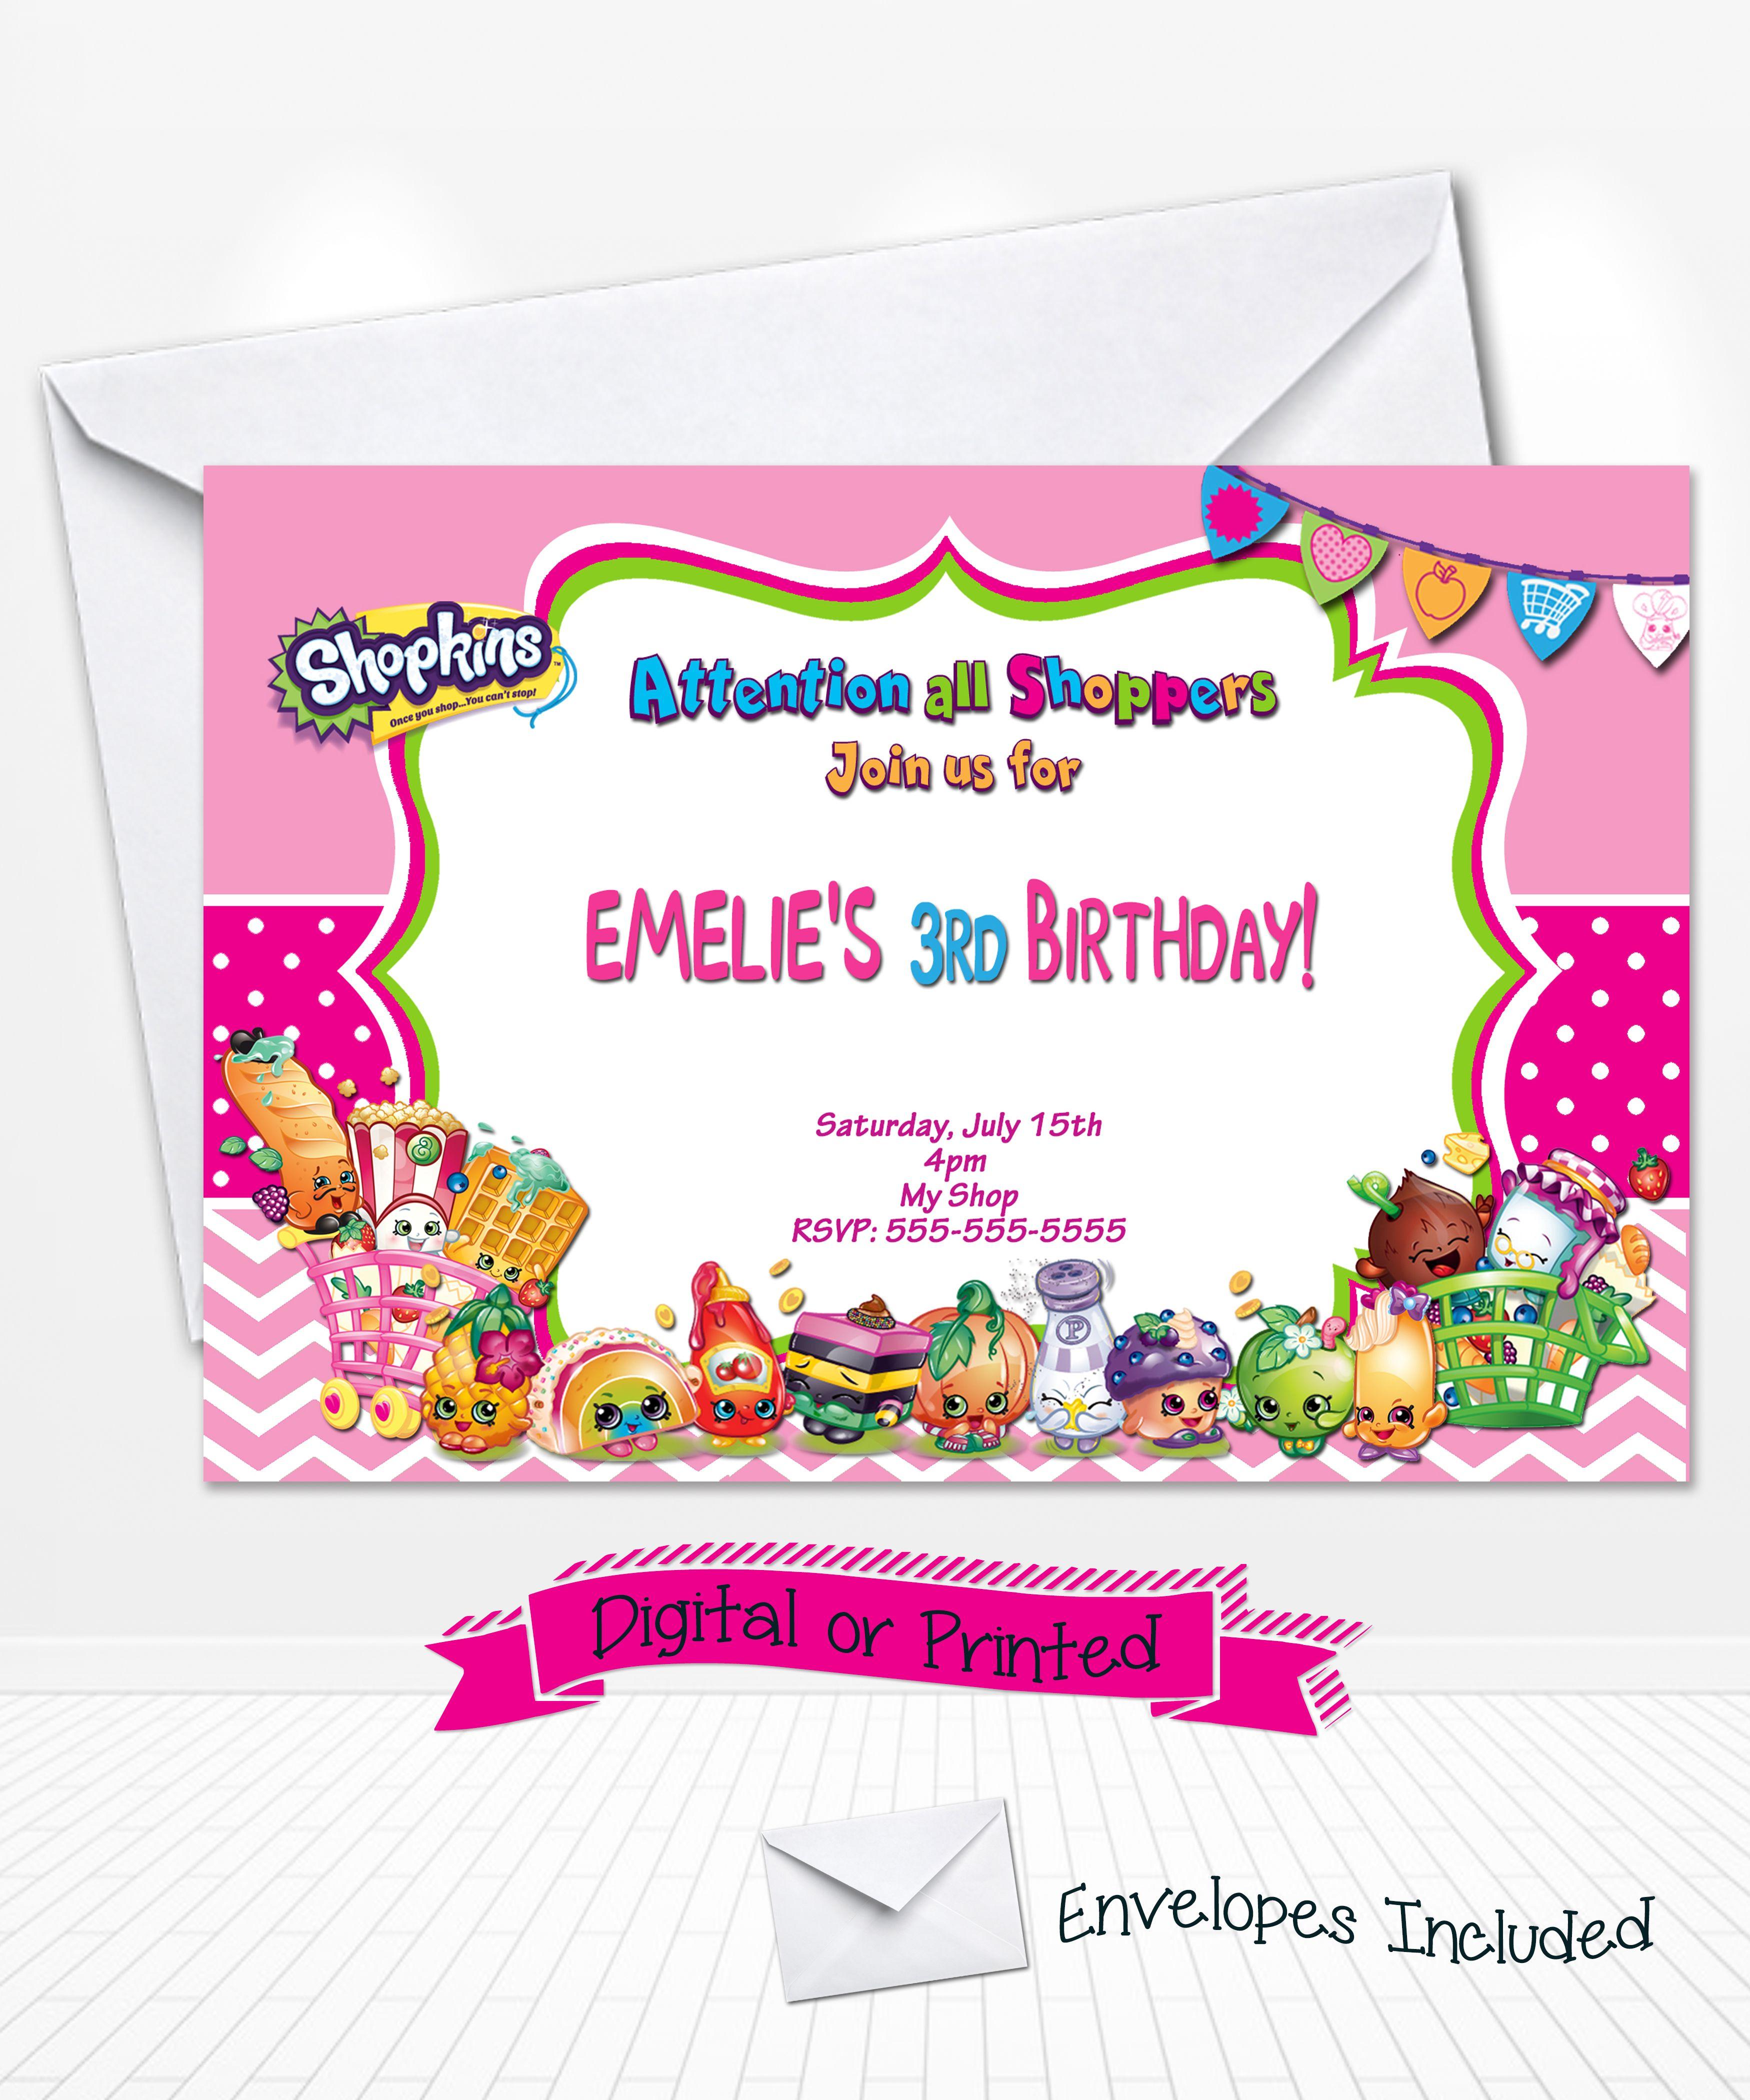 shopkins birthday party invitations – Invitations for Birthdays